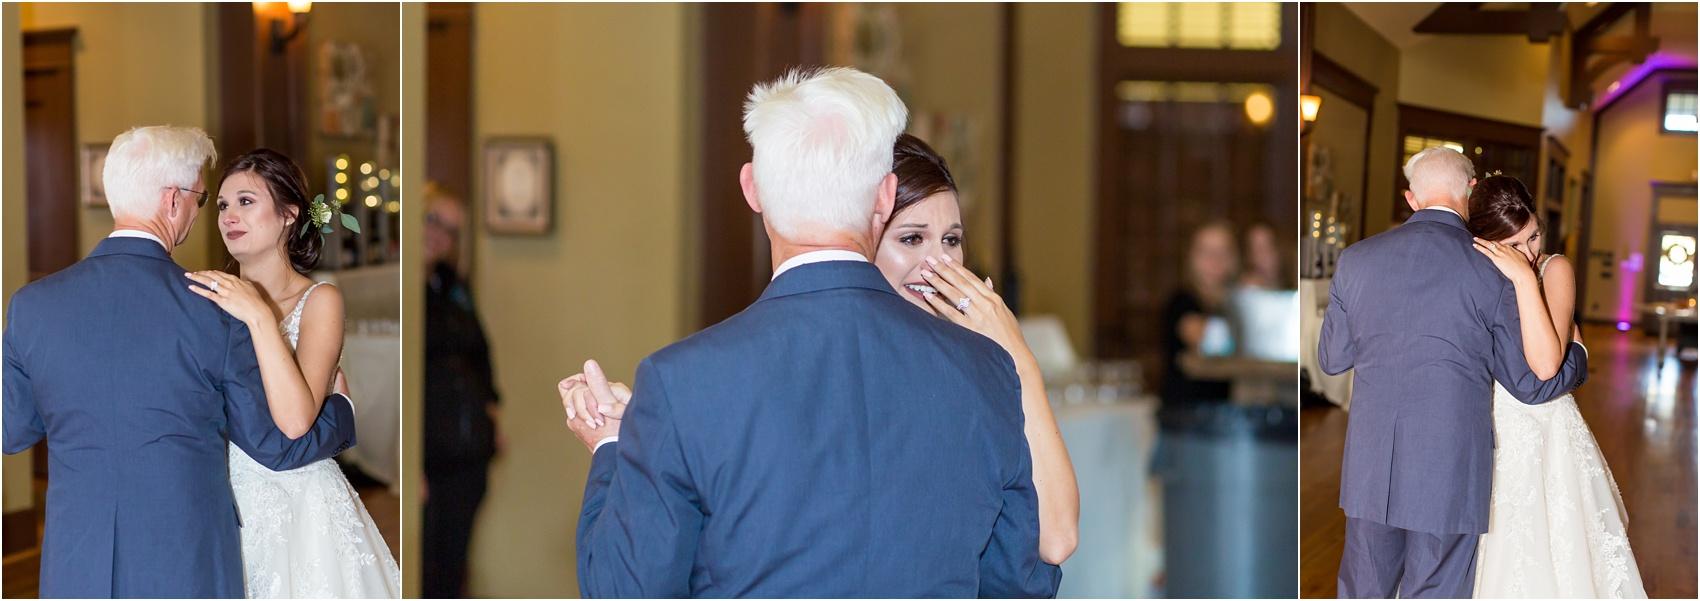 Savannah Eve Photography- May Wedding- Blog-13.jpg